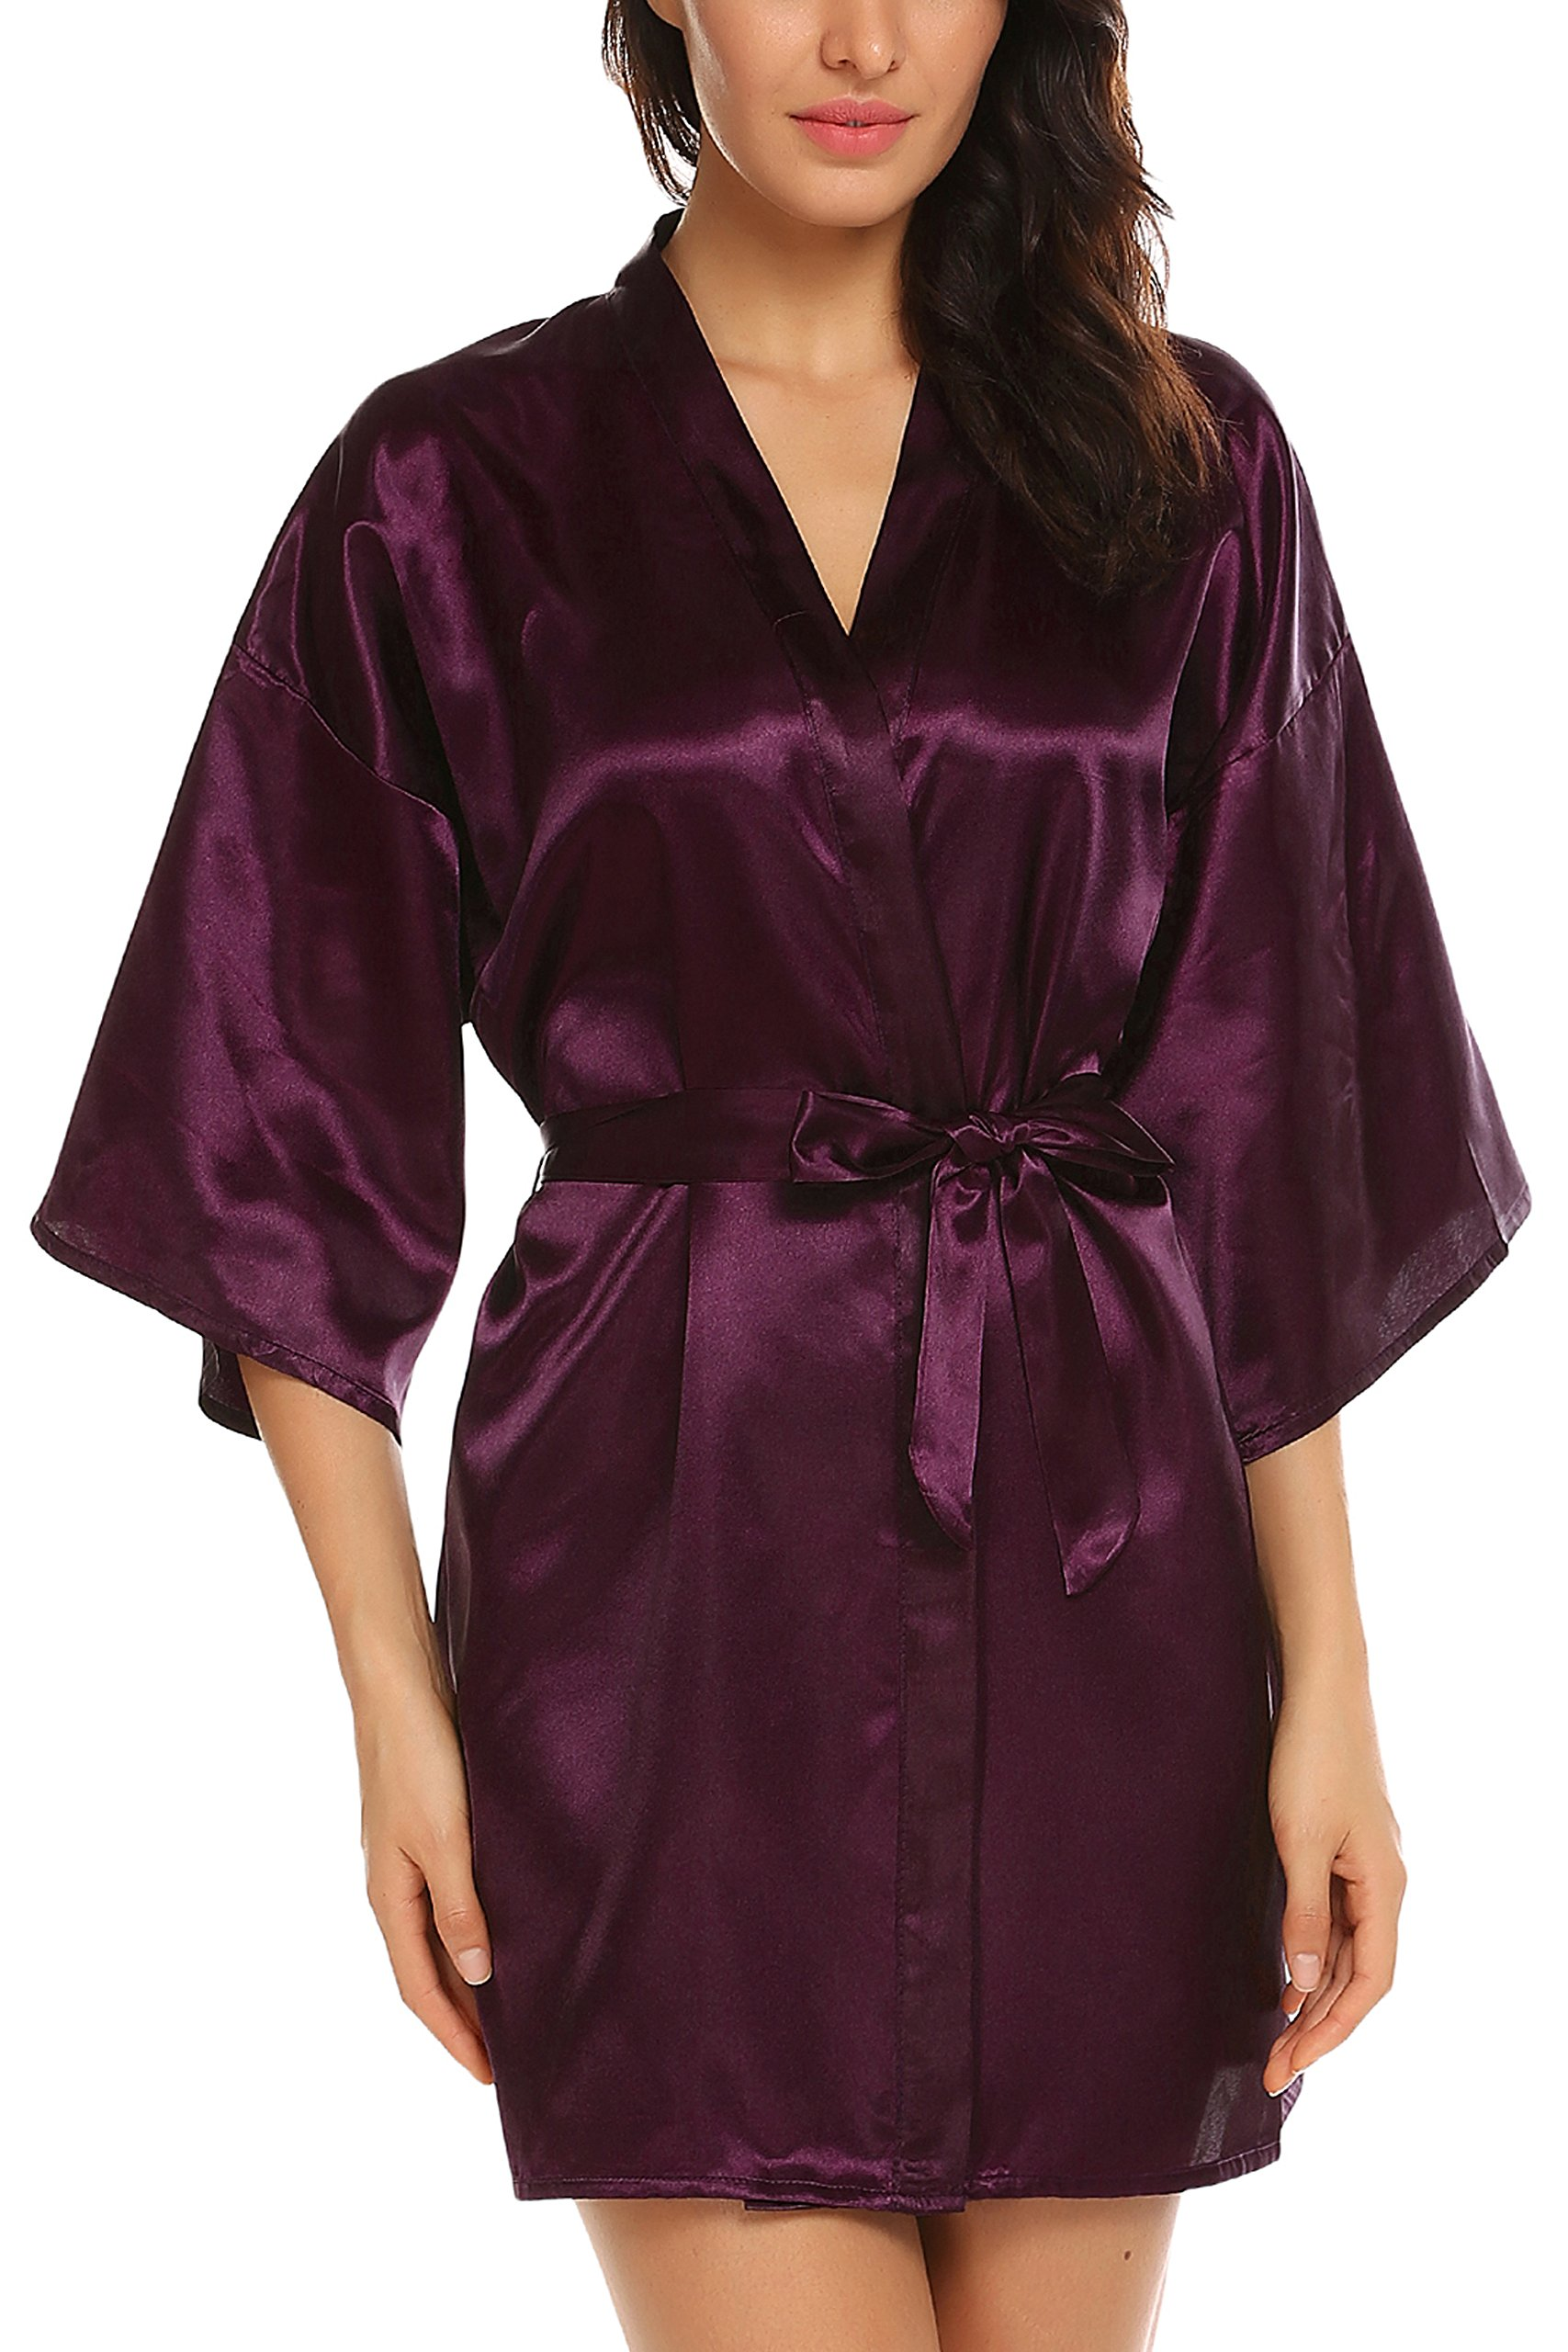 Avidlove Women's Kimono Robe Satin Lounge Bridesmaids Short Style Dark Purple XXL by Avidlove